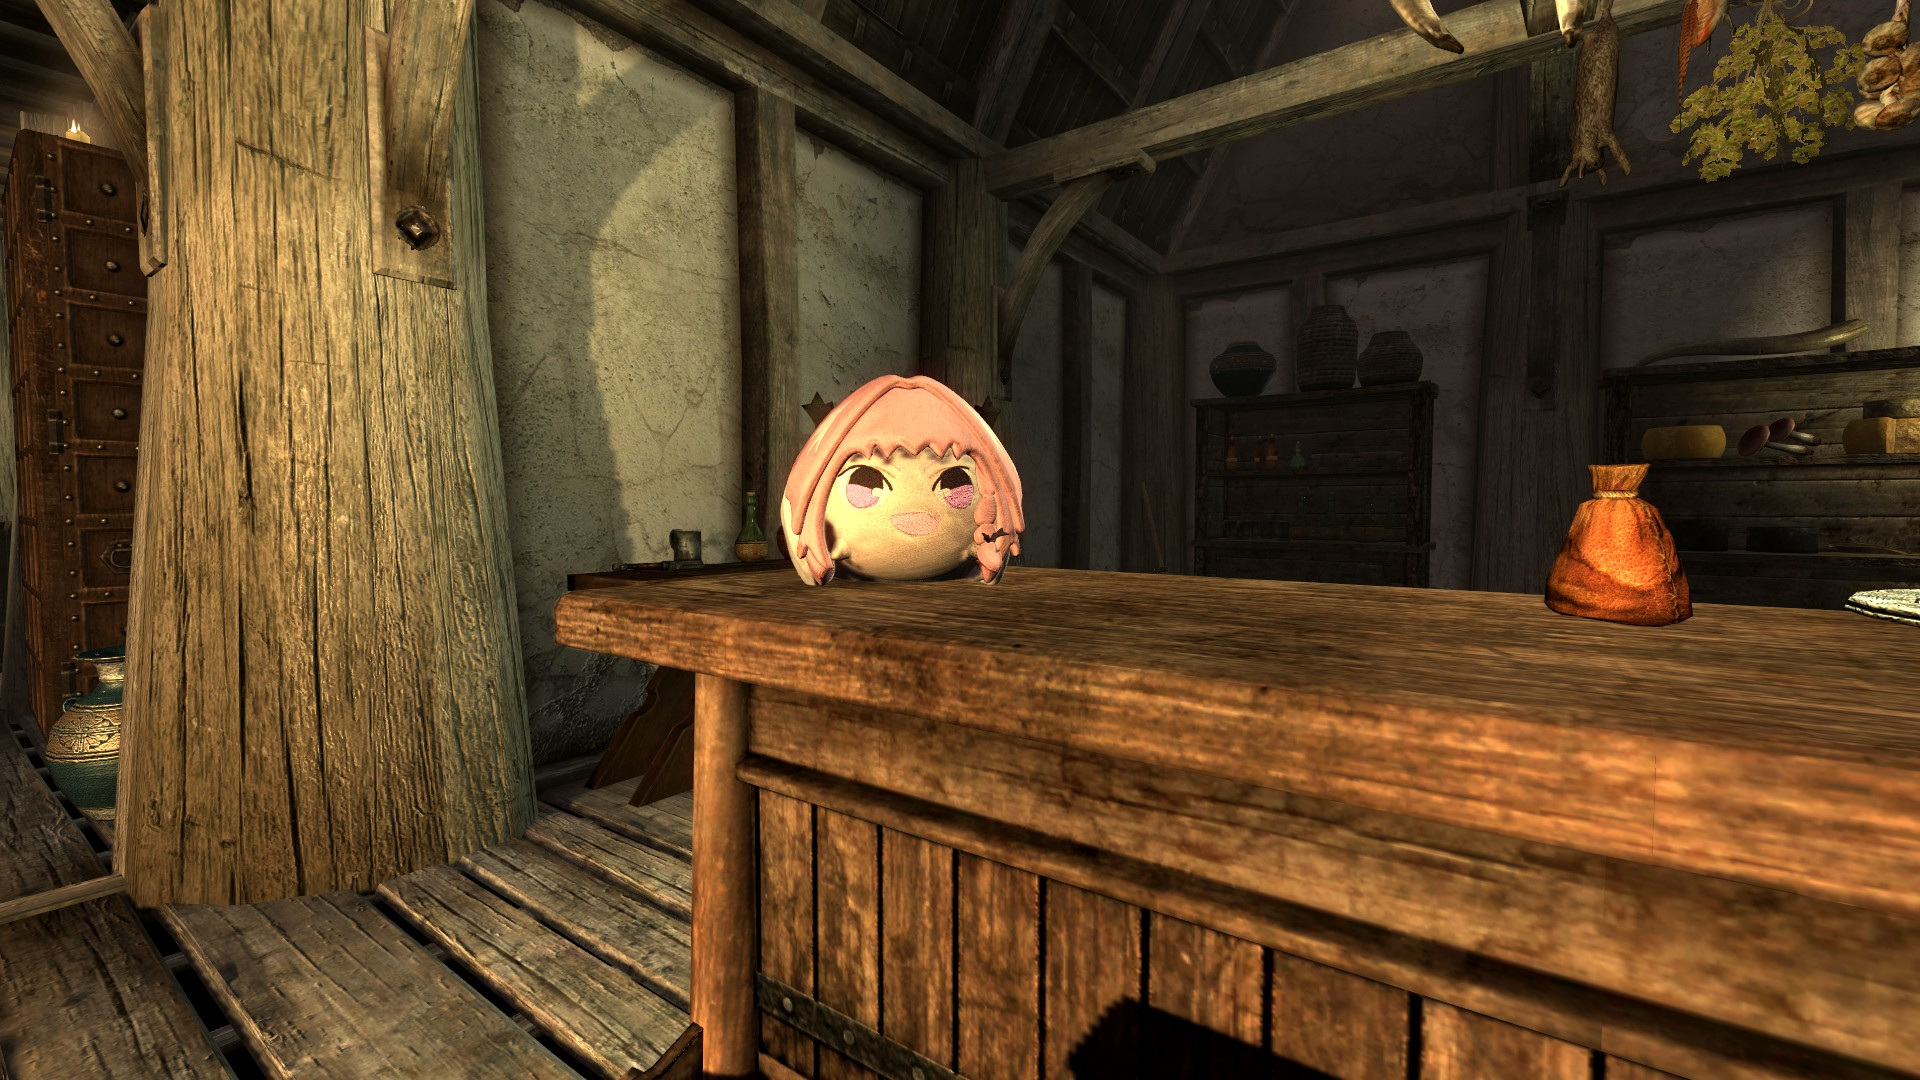 Cursed Astolfo Plushie in Skyrim